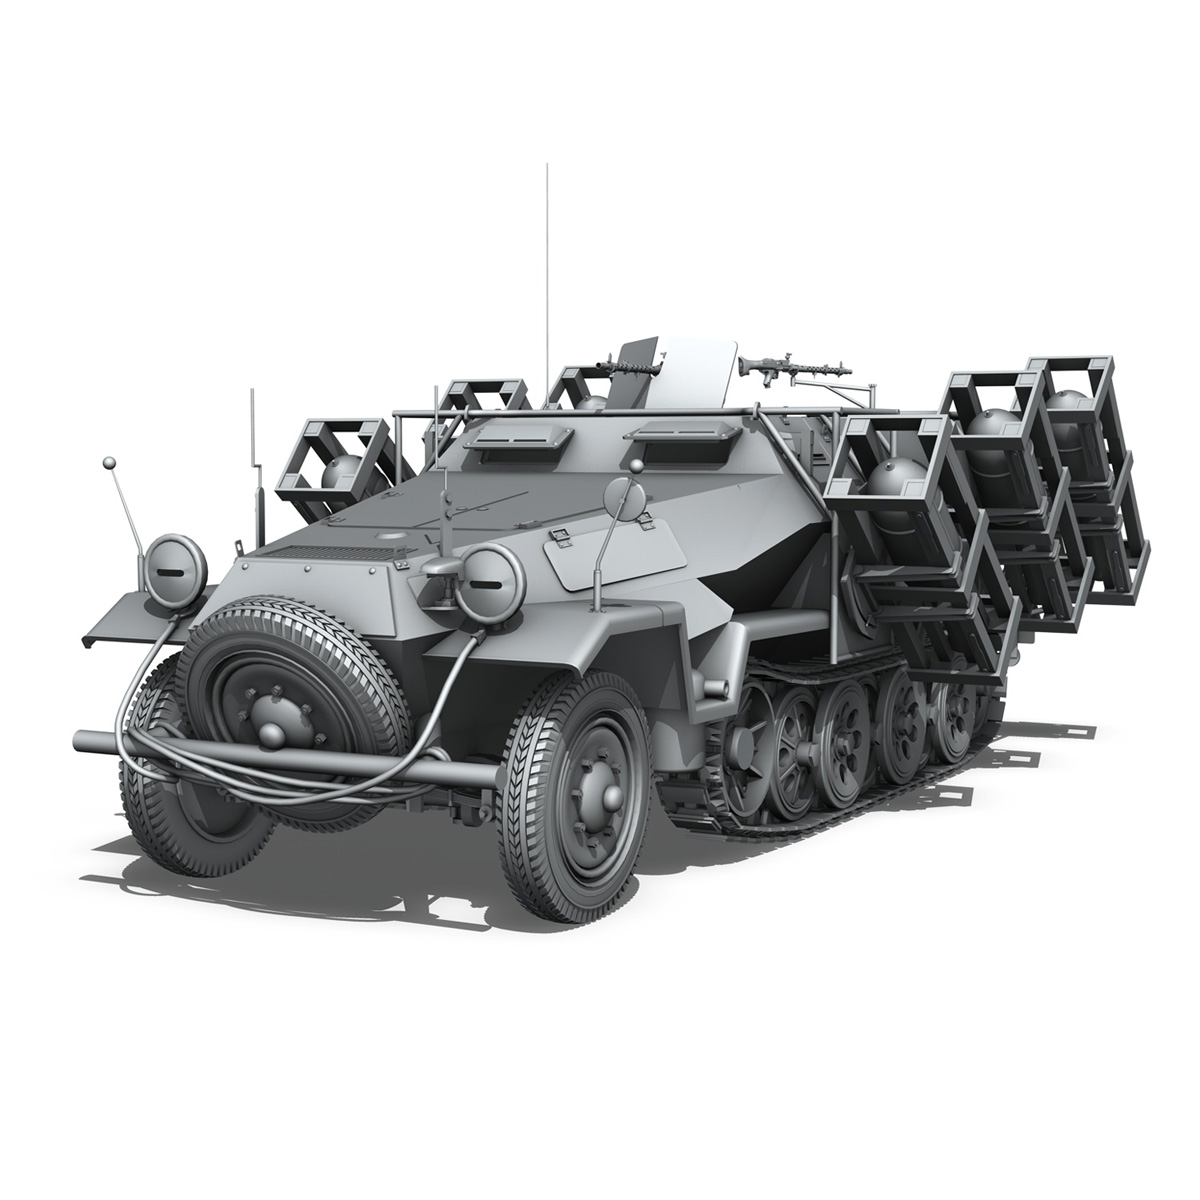 sdkfz 251 ausf.b – ground stuka 3d model 3ds fbx c4d lwo obj 251681